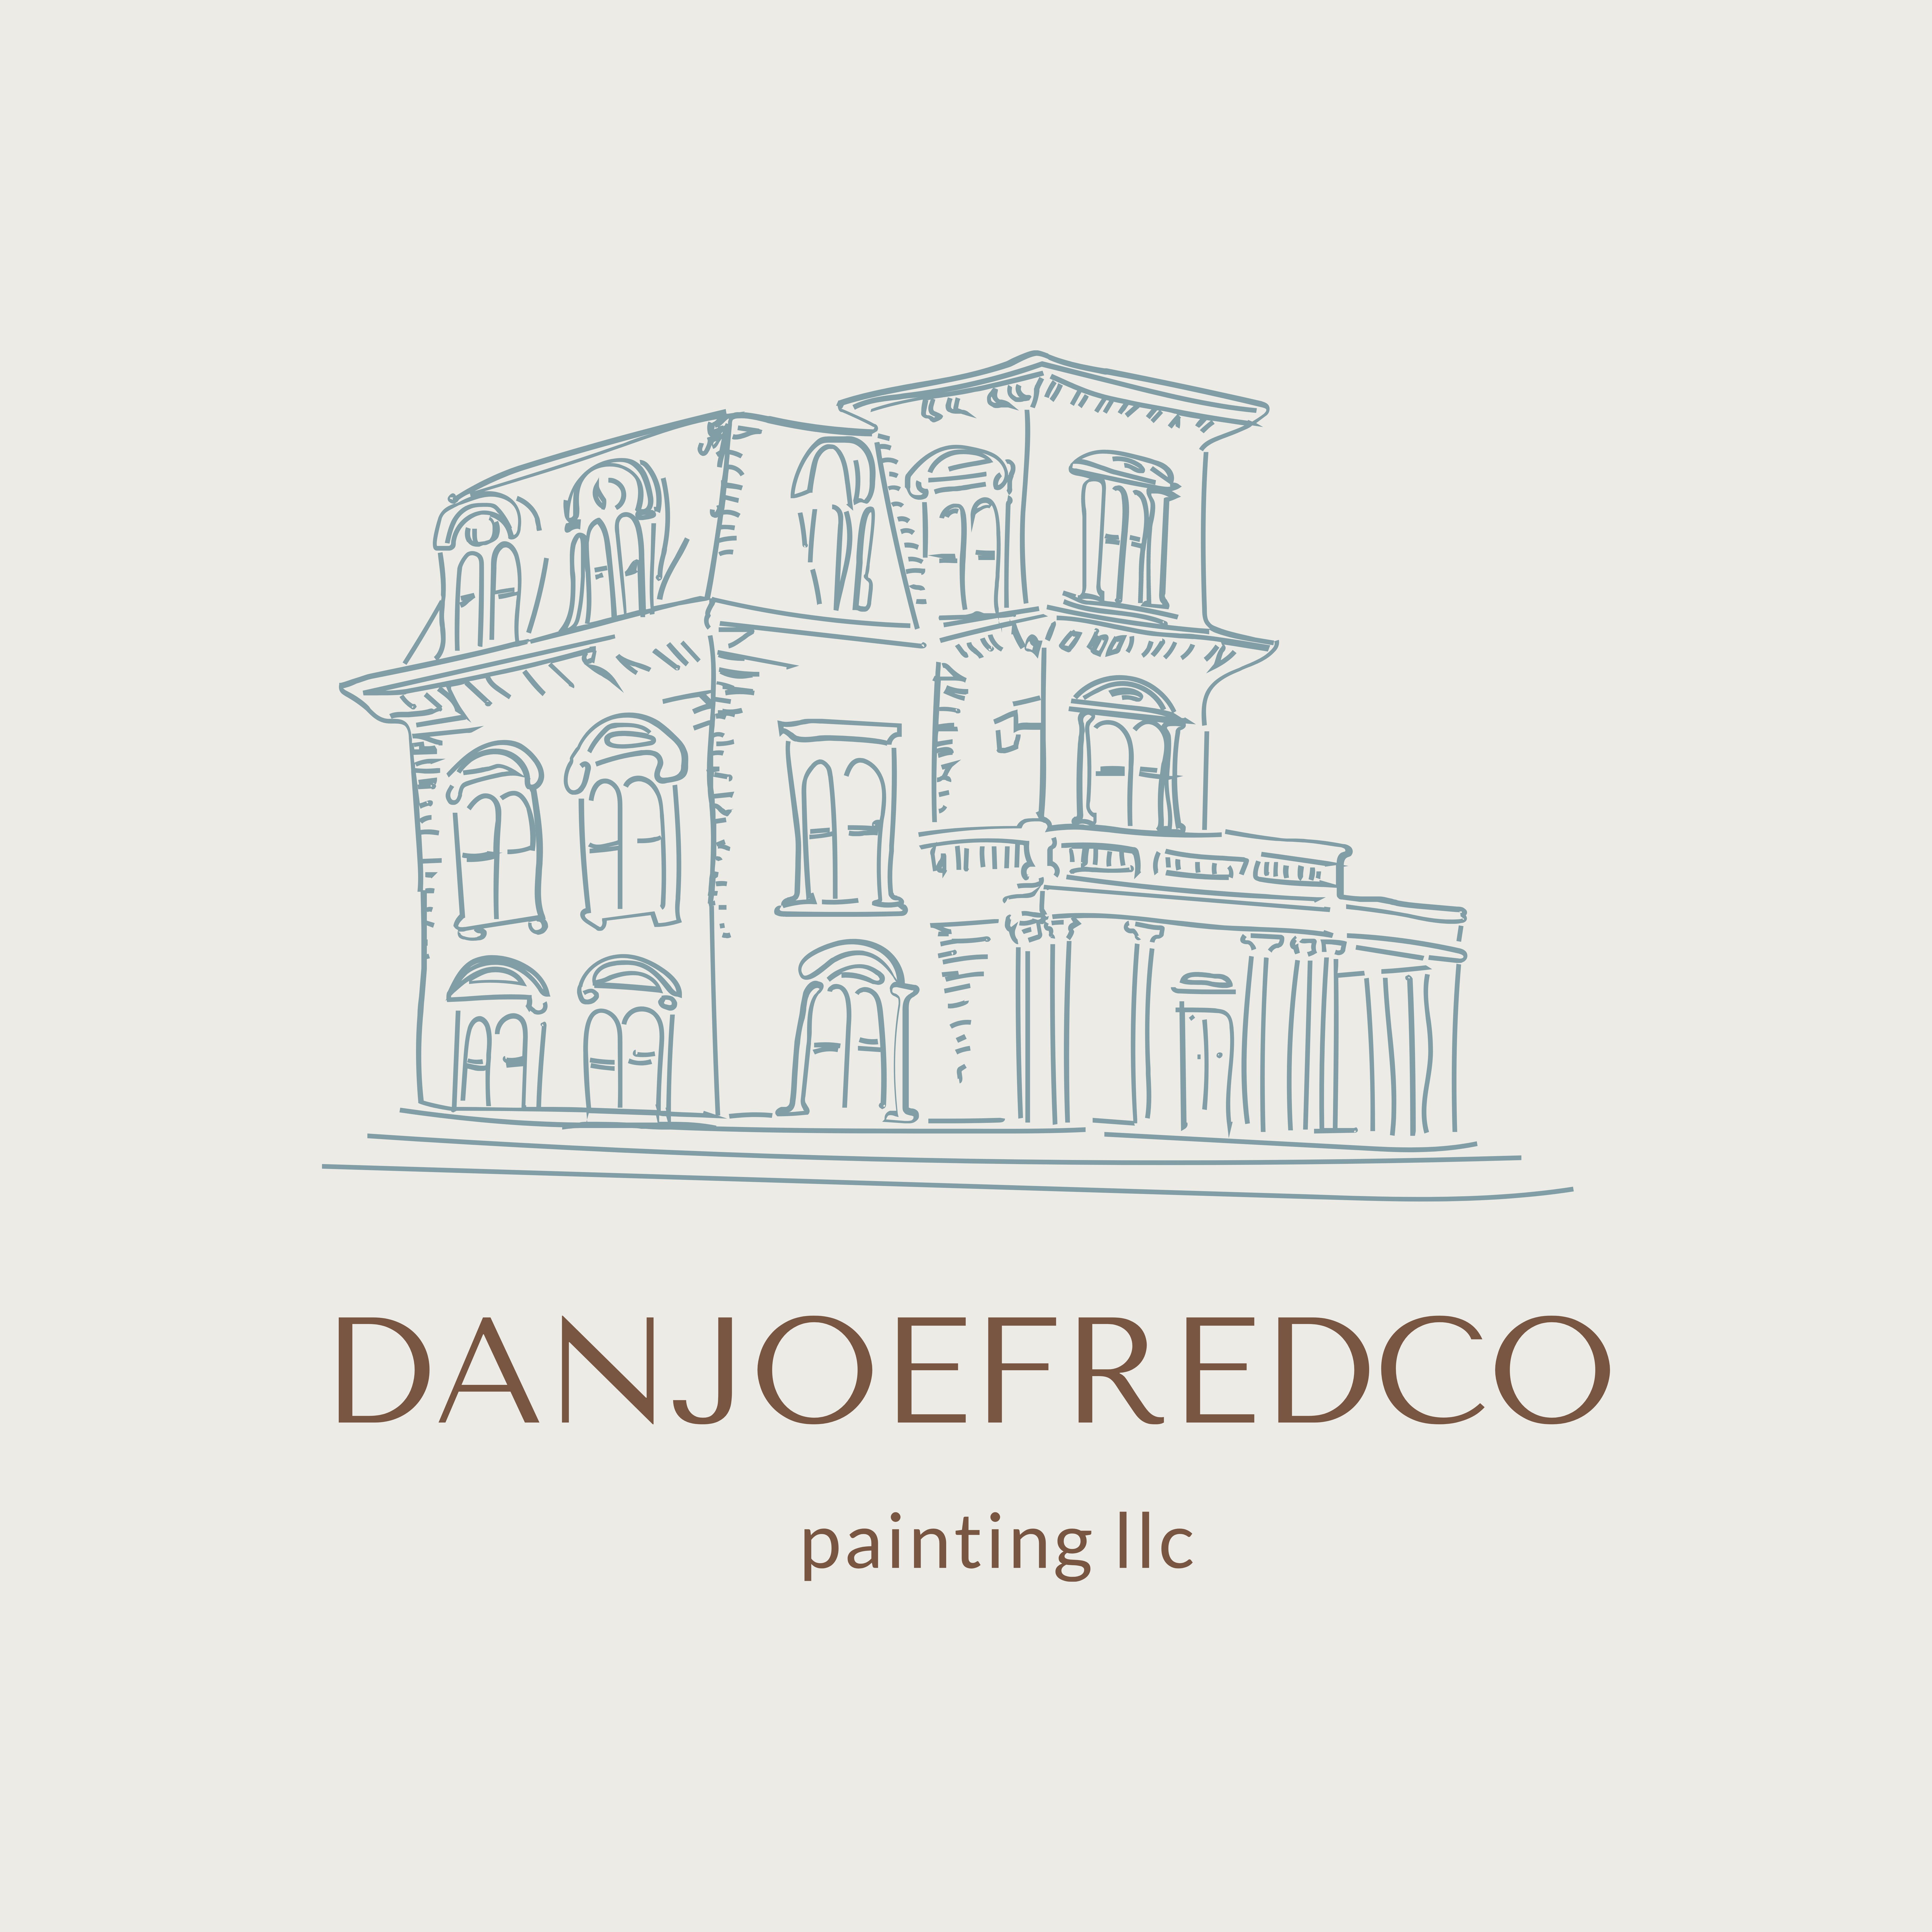 Danjoefredco logo